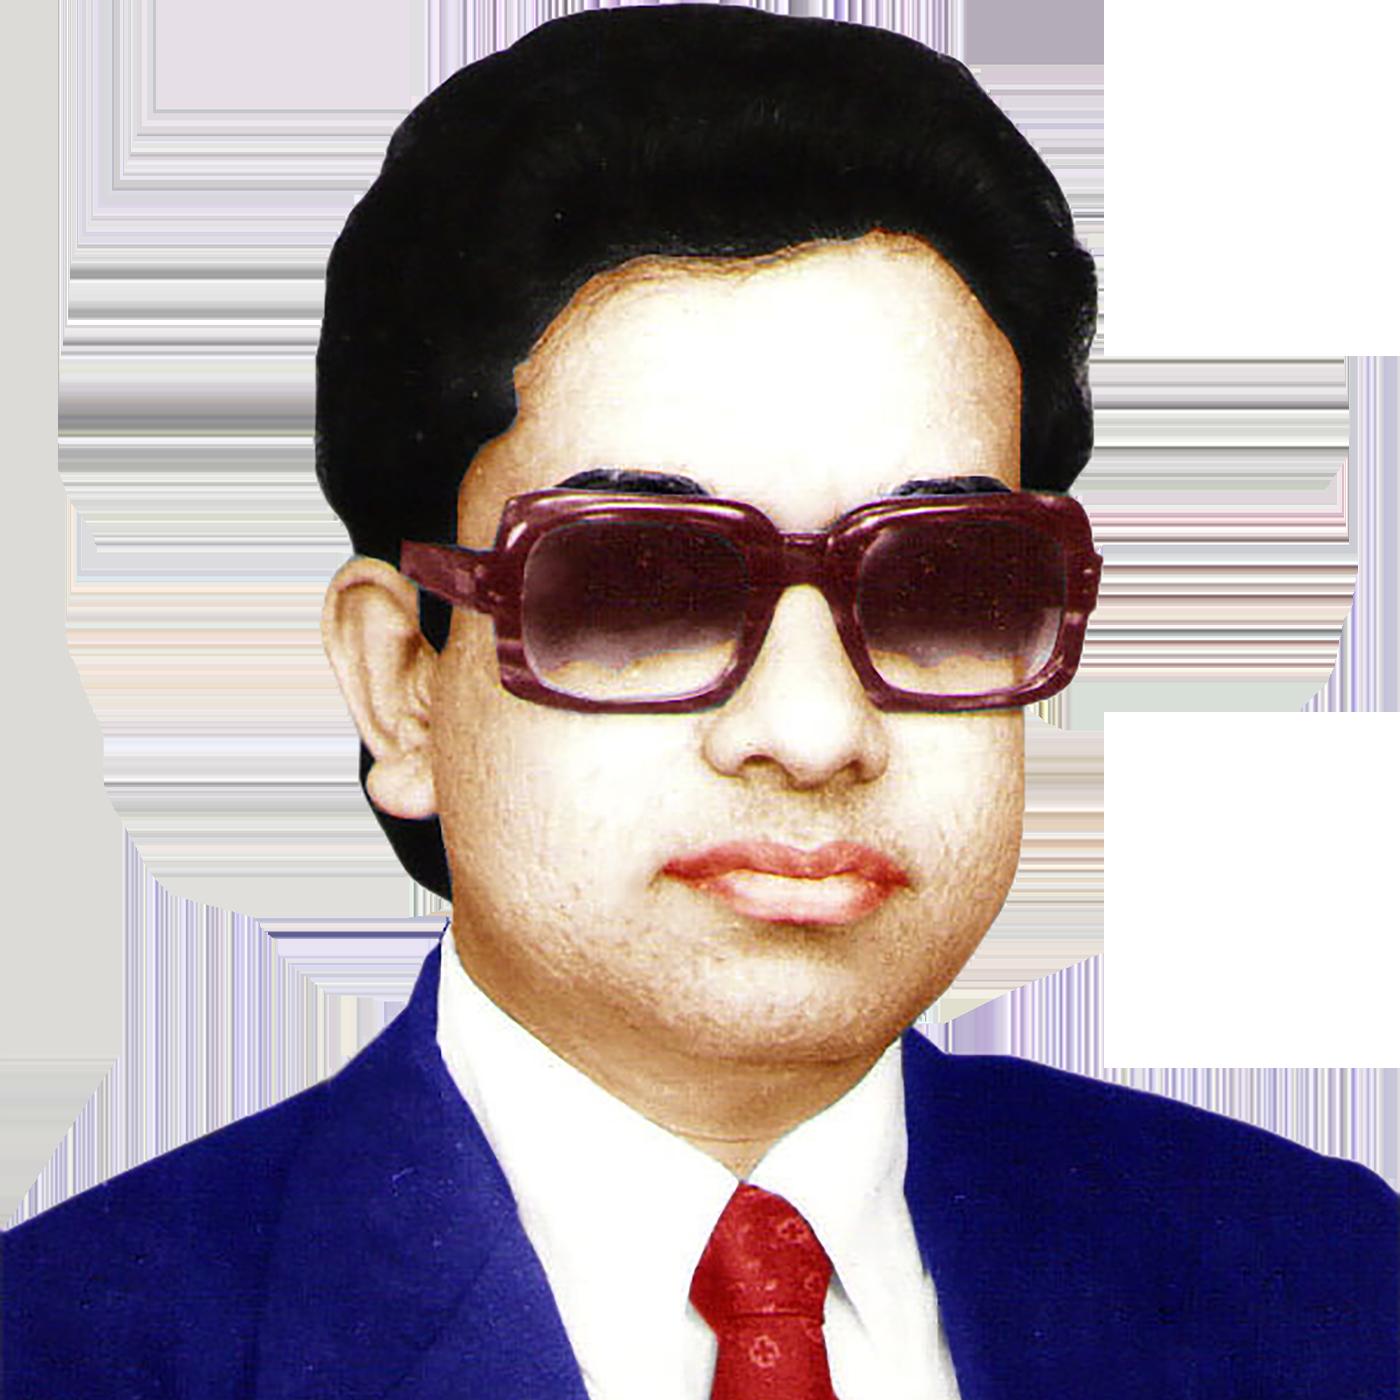 File:Waliur Rahman png - Wikimedia Commons